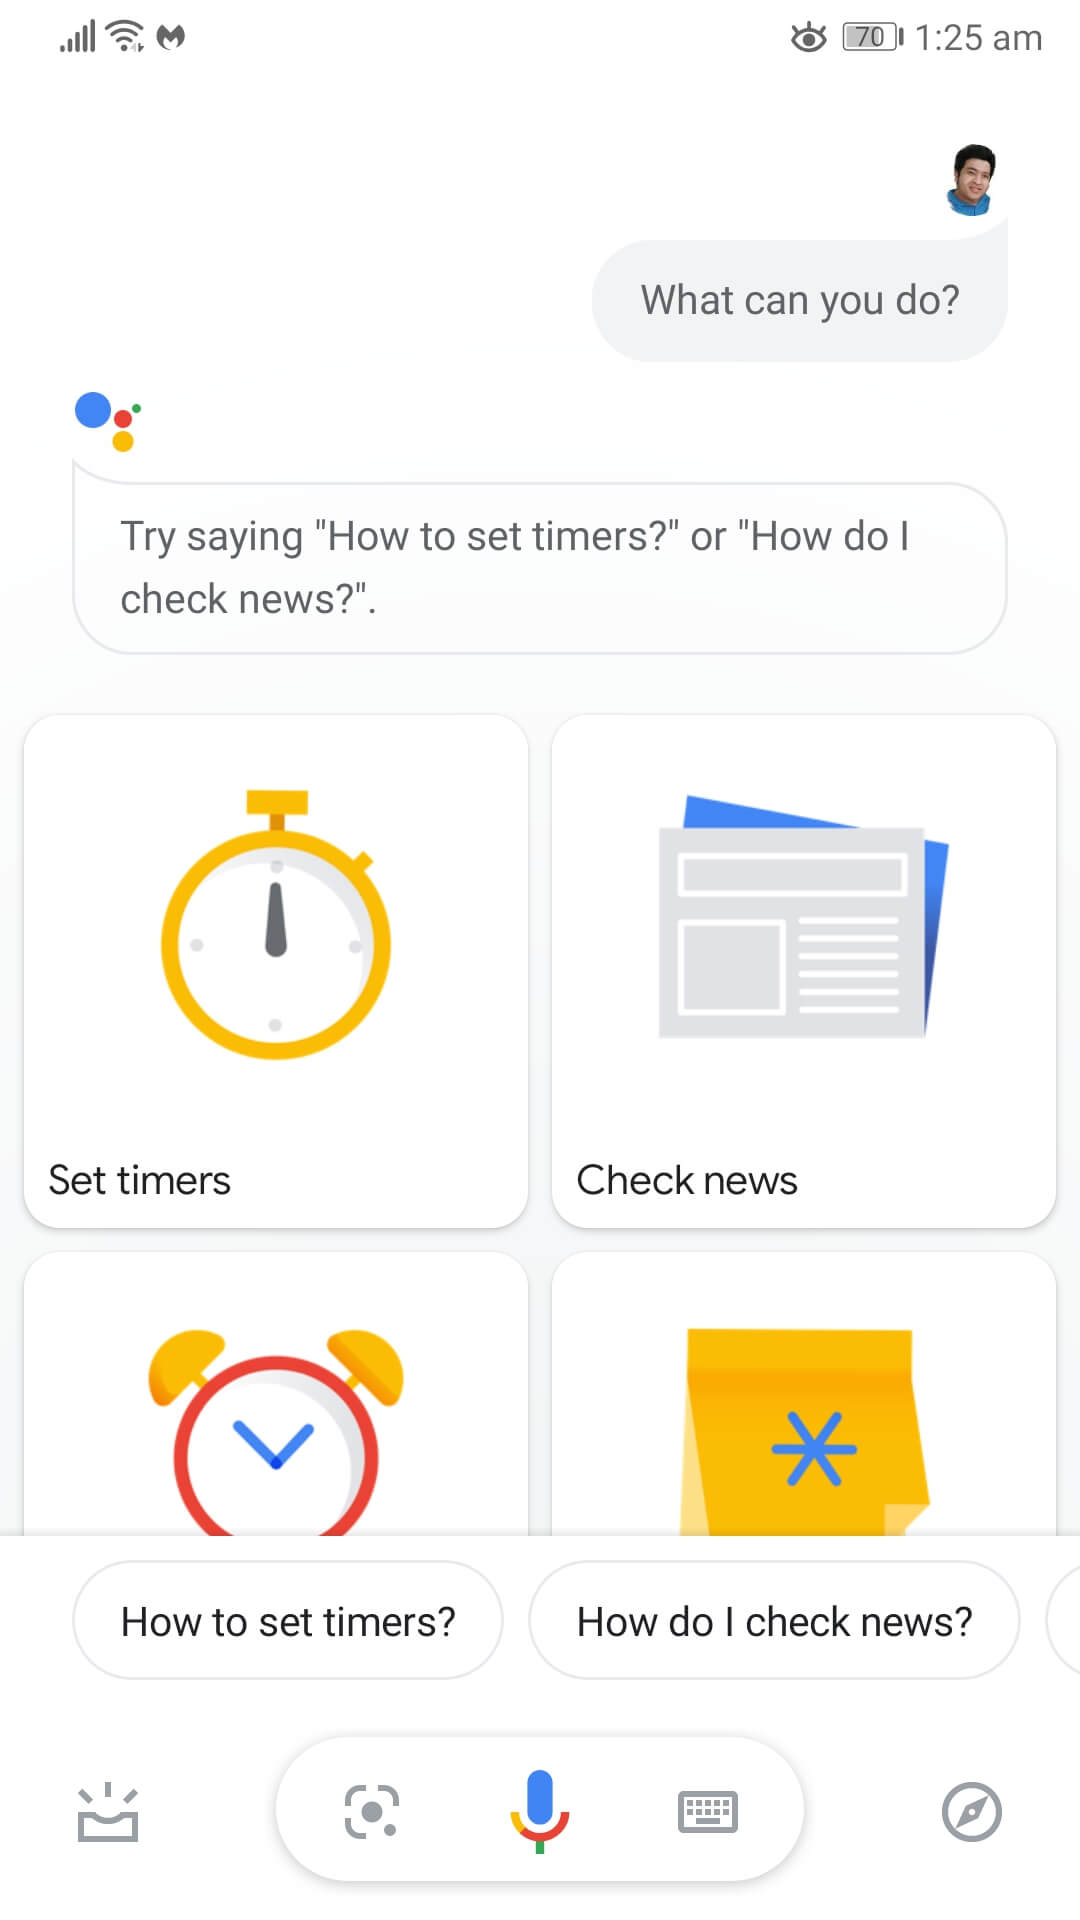 ok-google-commands-assistant-questions-usefull